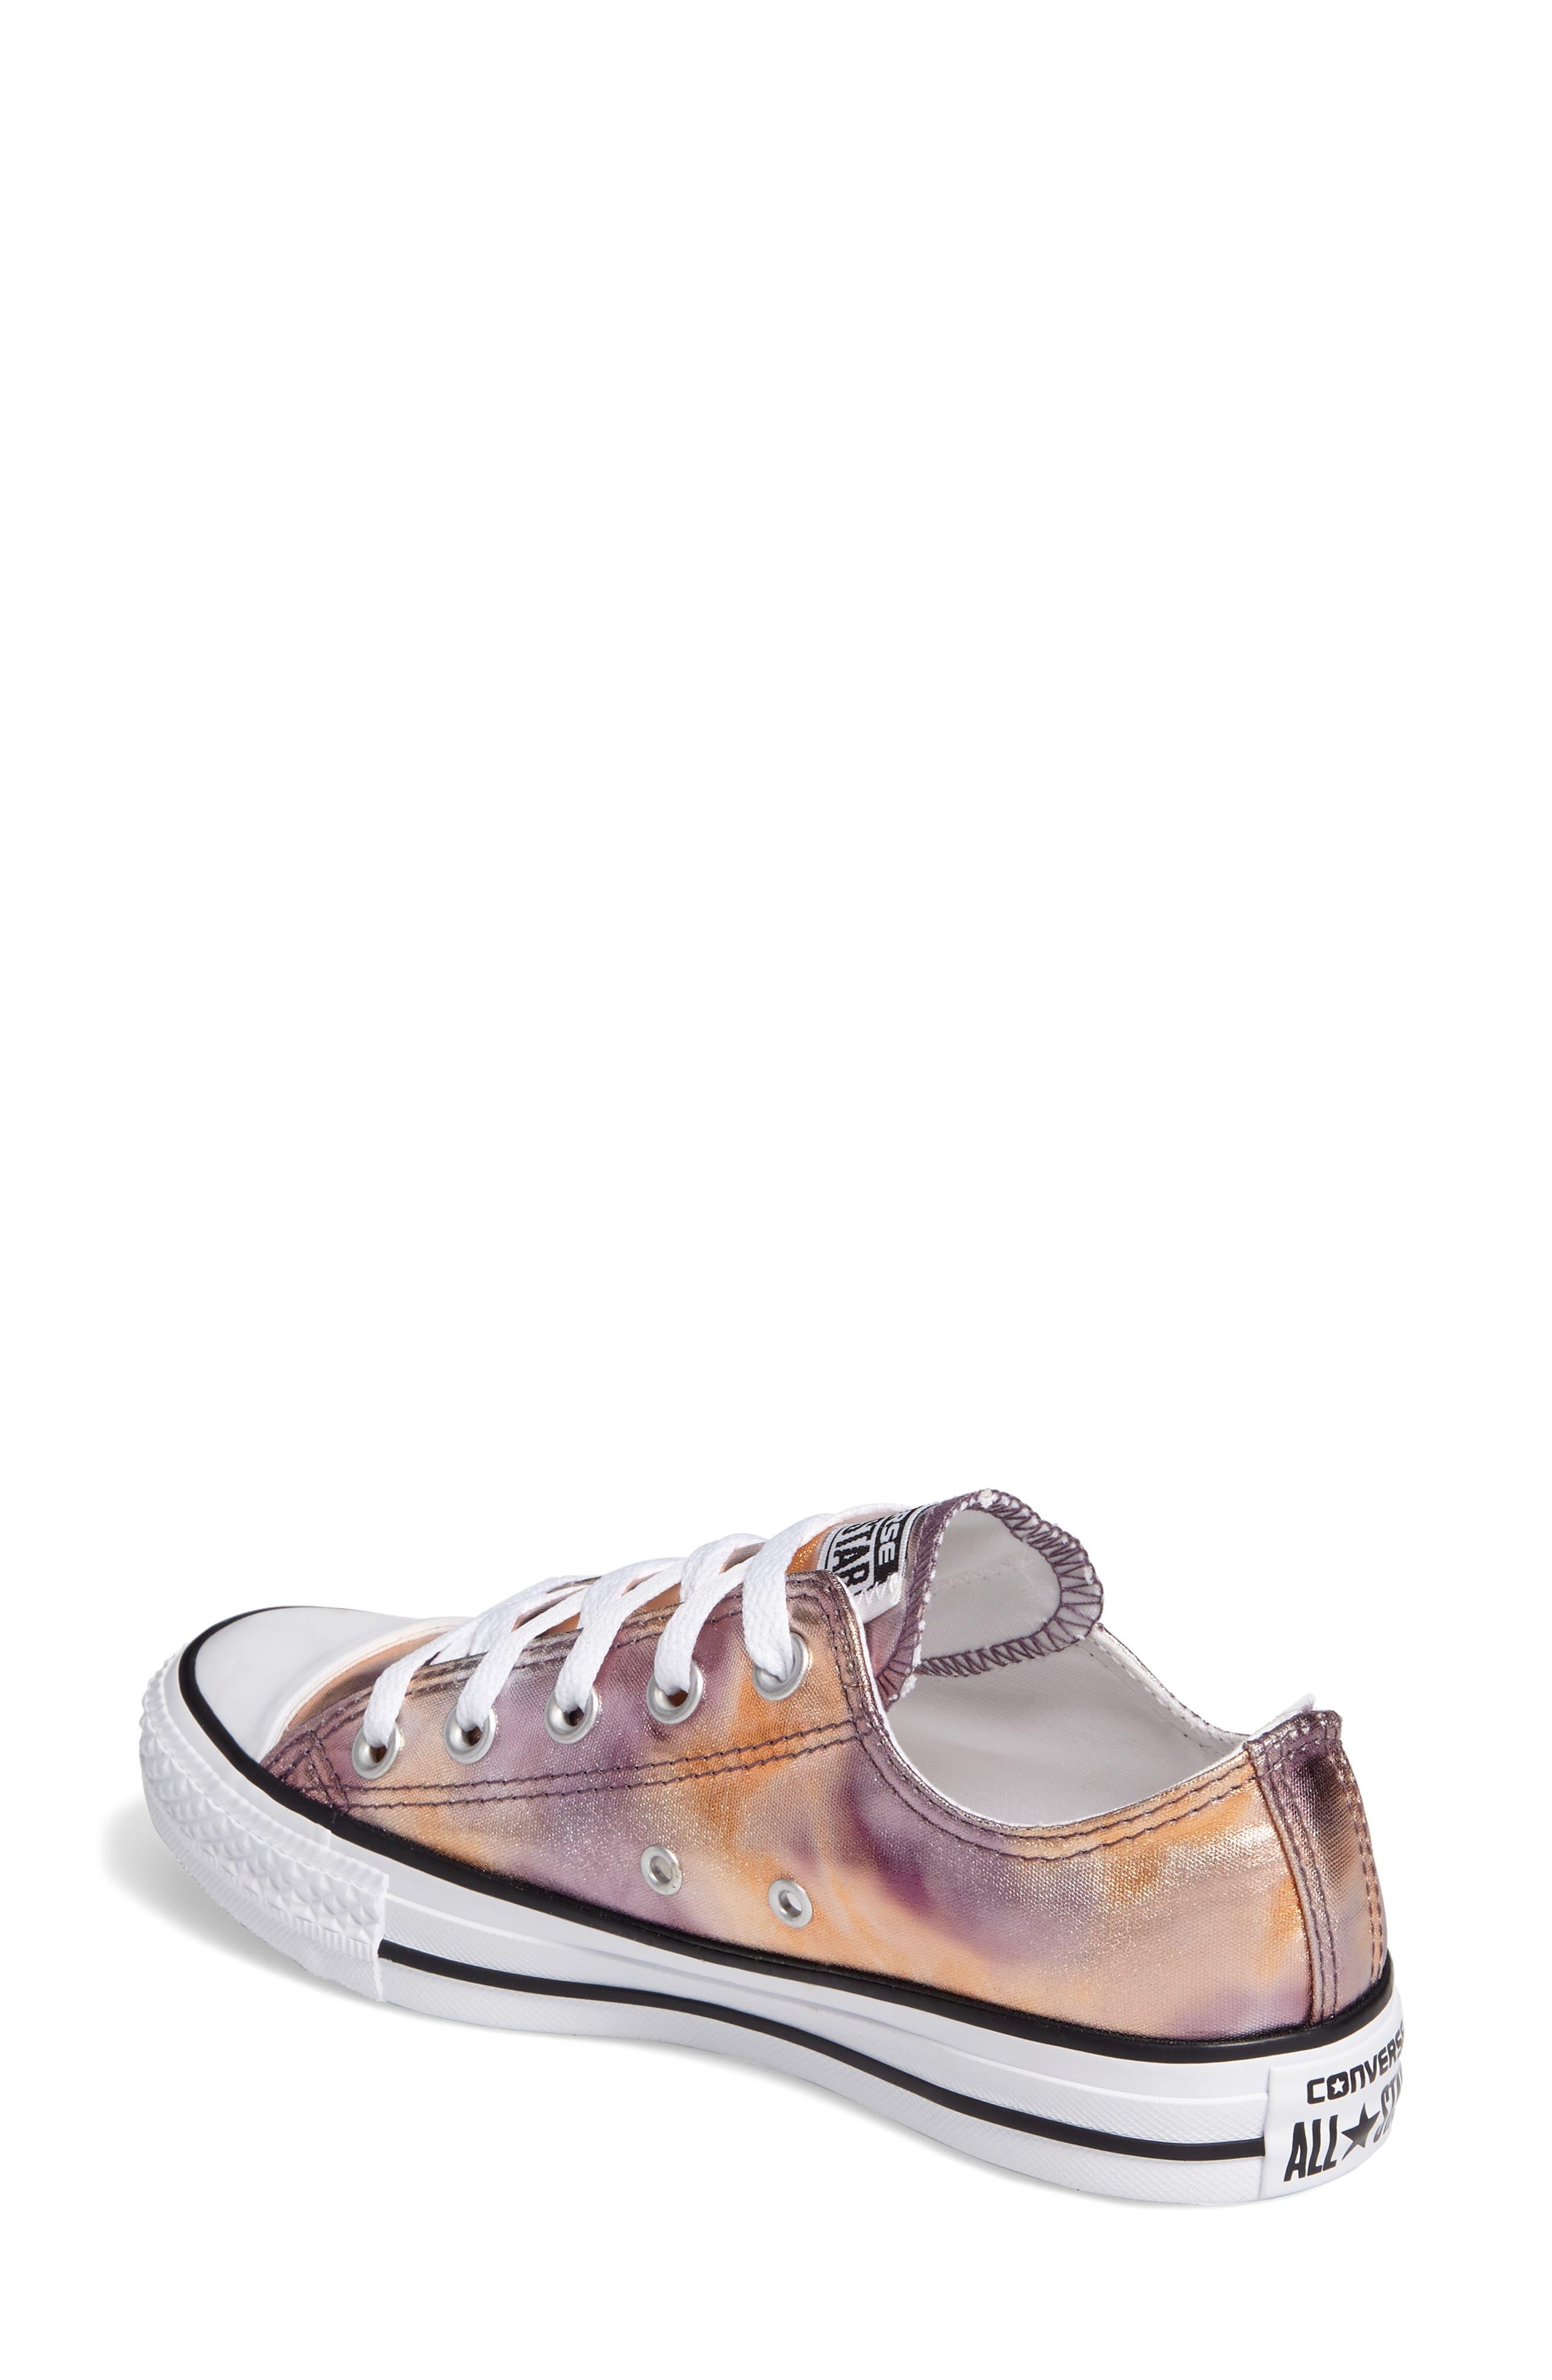 Chuck Taylor<sup>®</sup> All Star<sup>®</sup> Seasonal Metallic Ox Low Top Sneaker,                             Alternate thumbnail 2, color,                             Dusk Pink